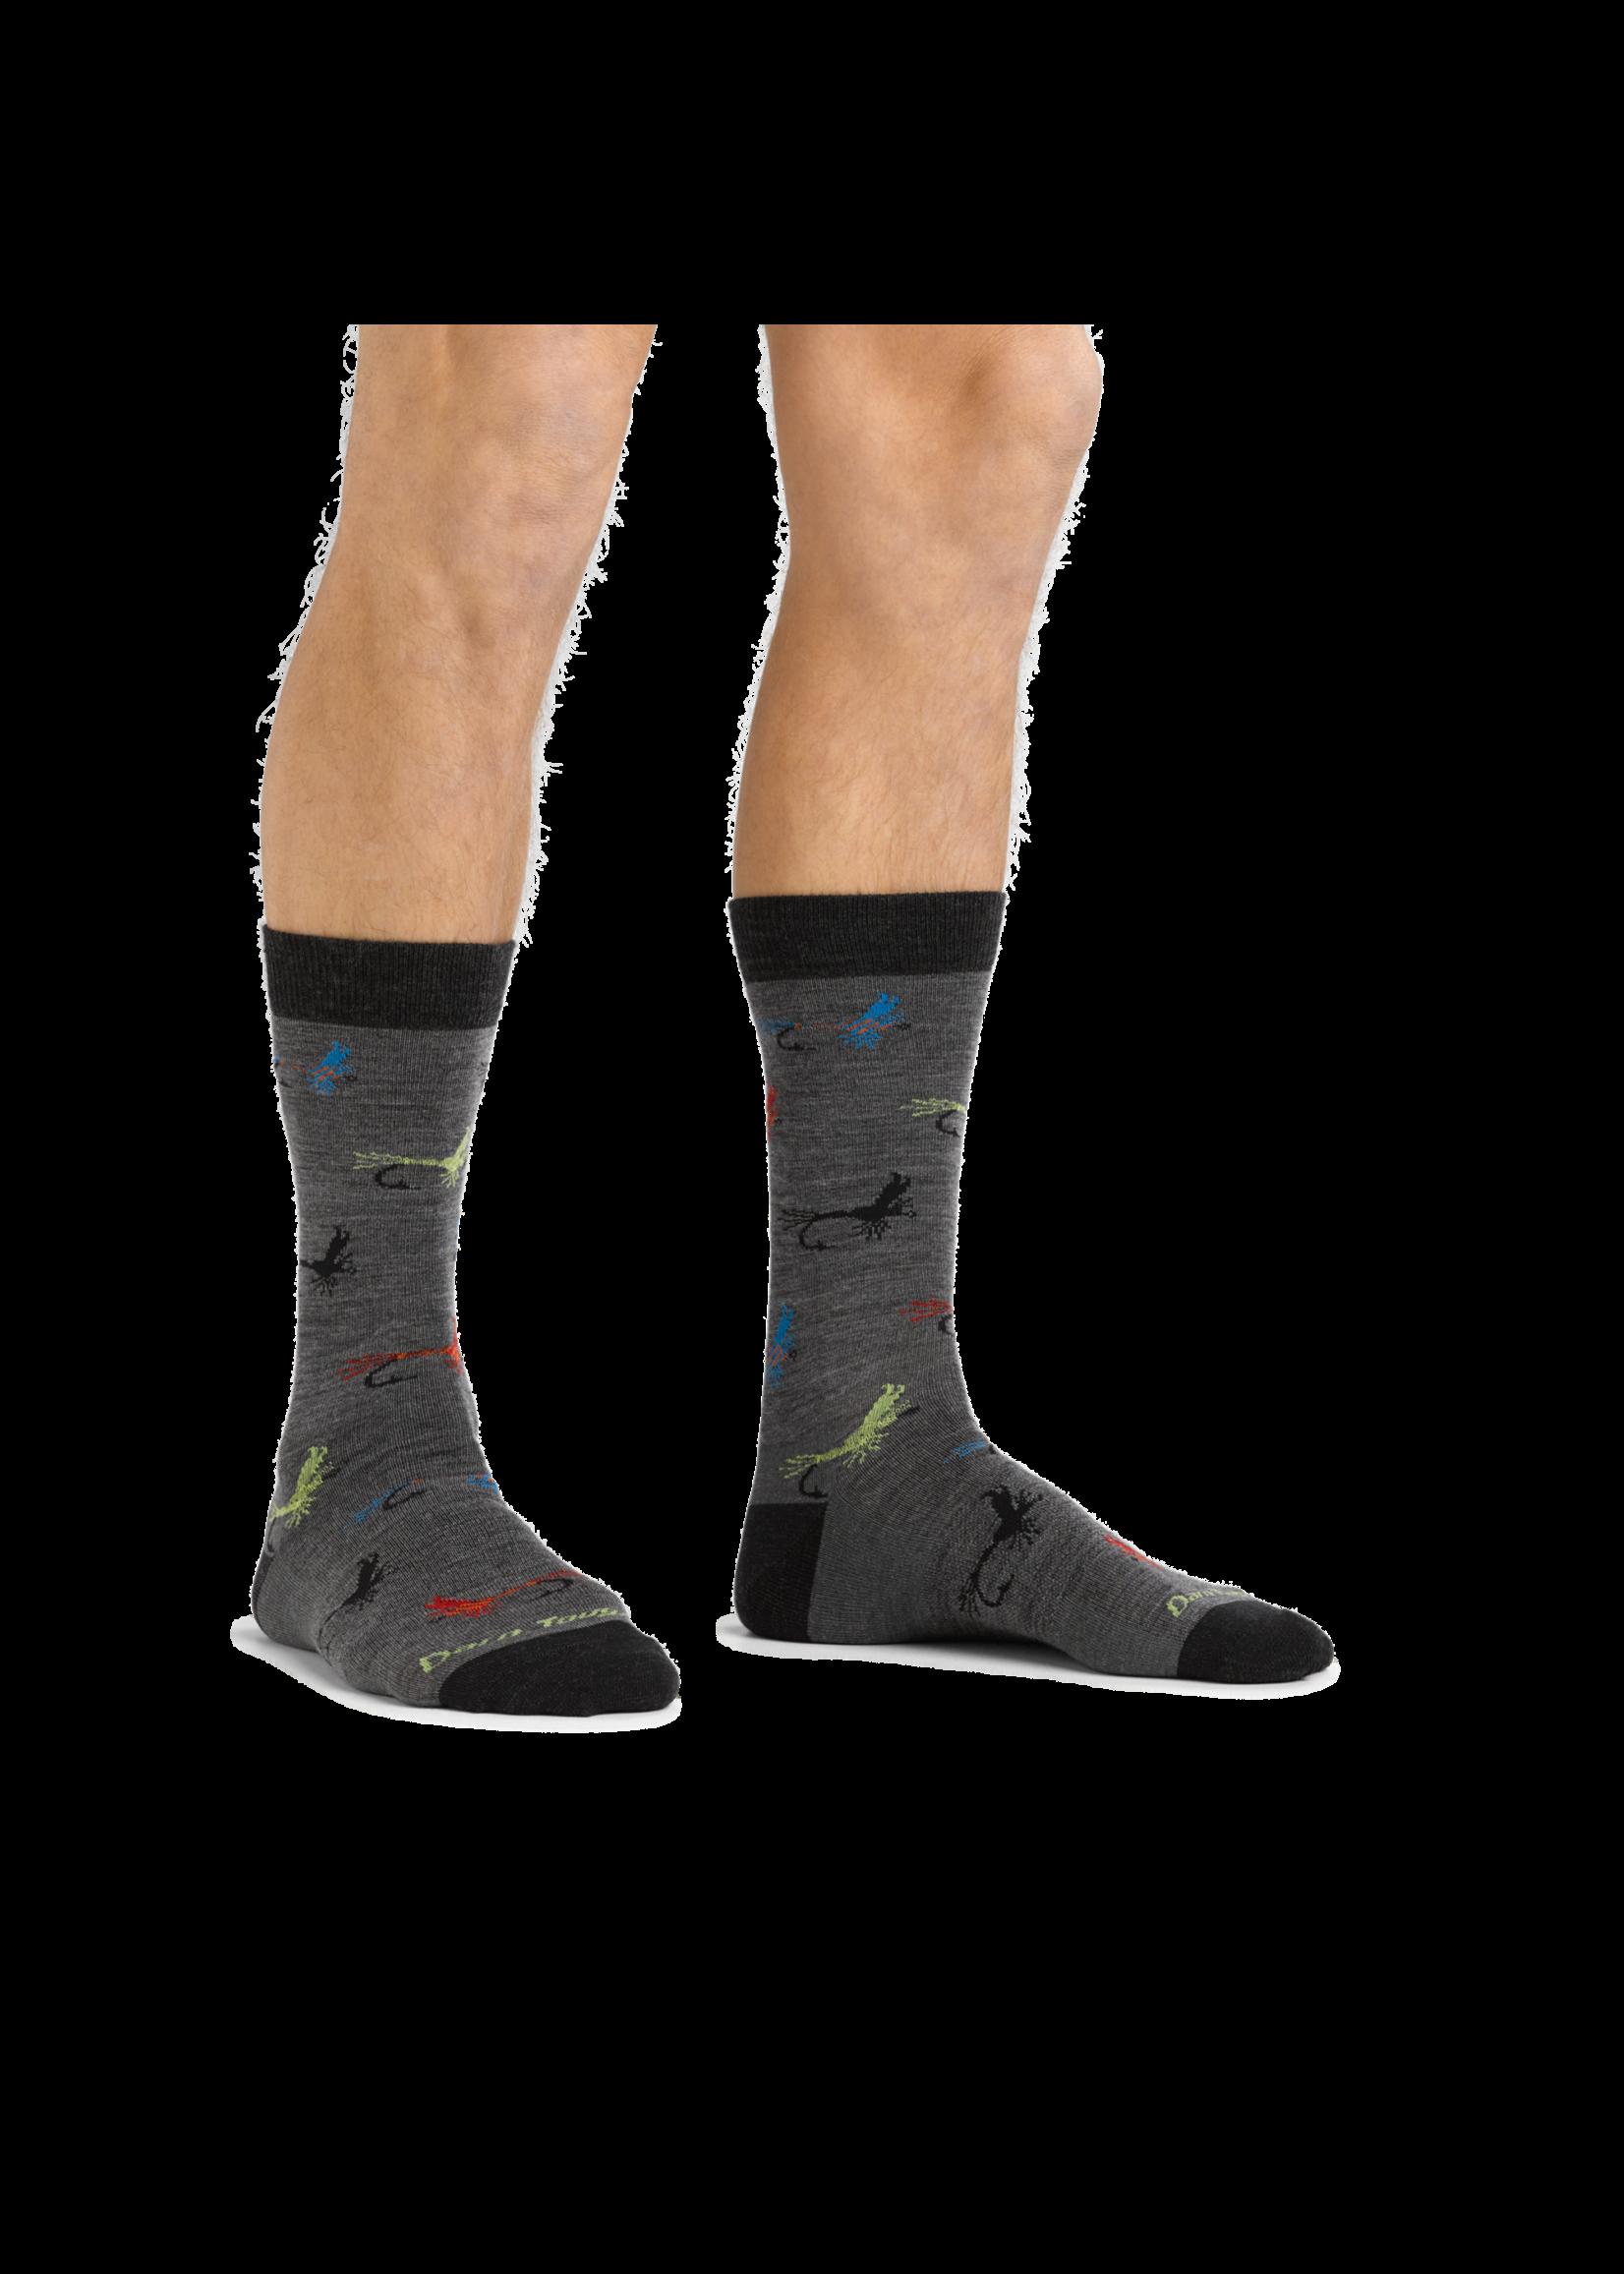 Darn Tough Men's Pop McFly Crew Lightweight Lifestyle Sock